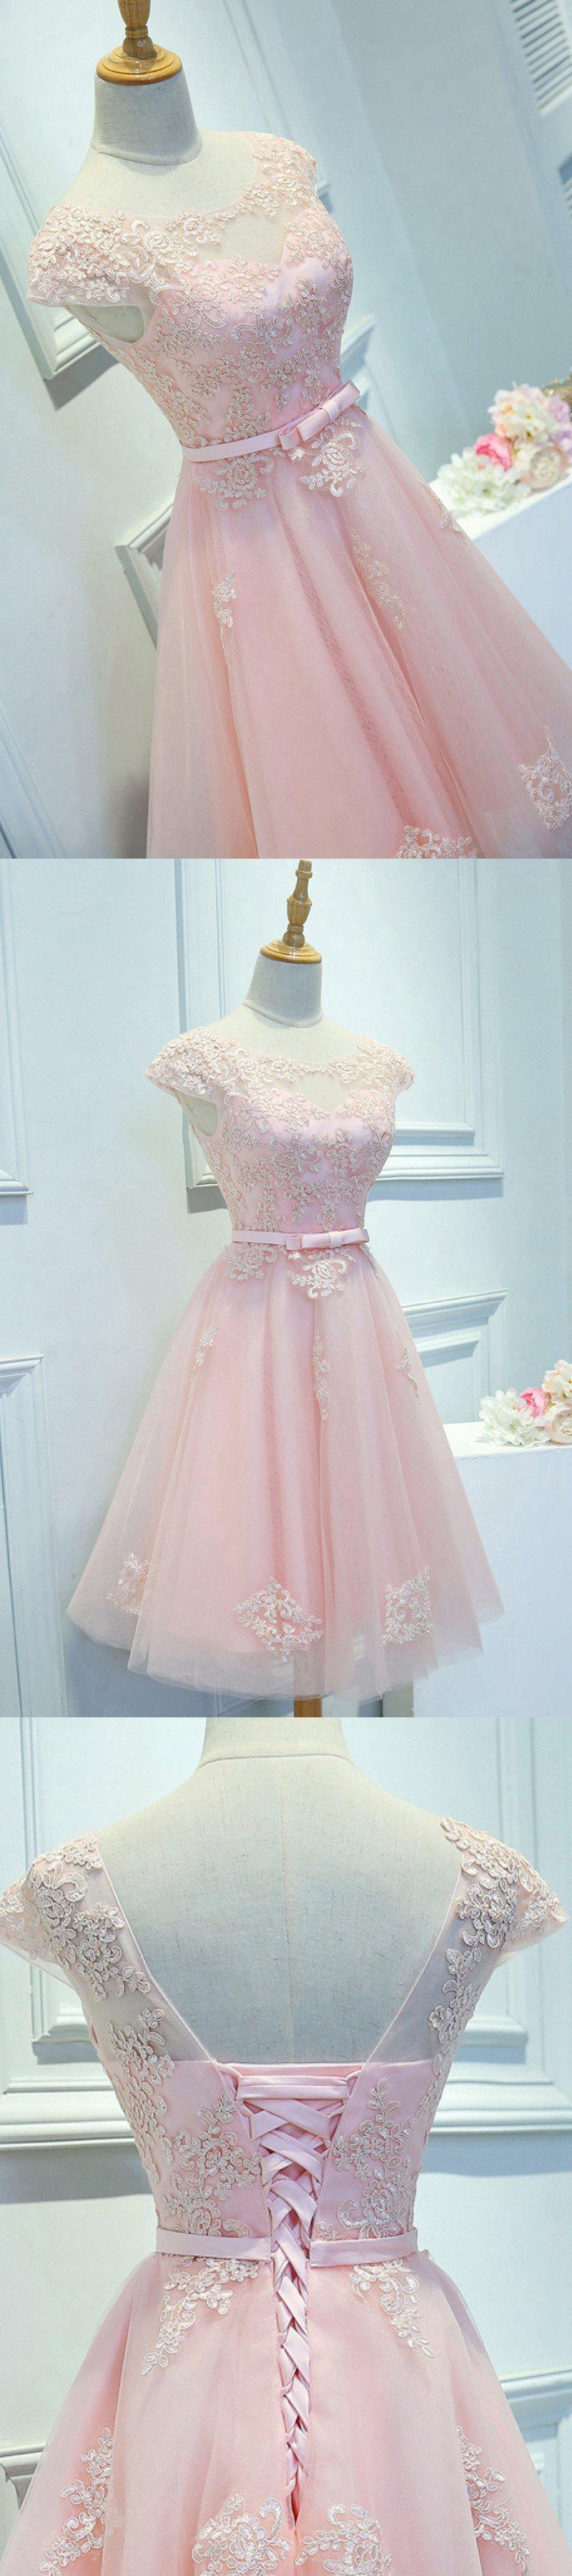 Light pink homecoming dressshort prom dressback to school dresses